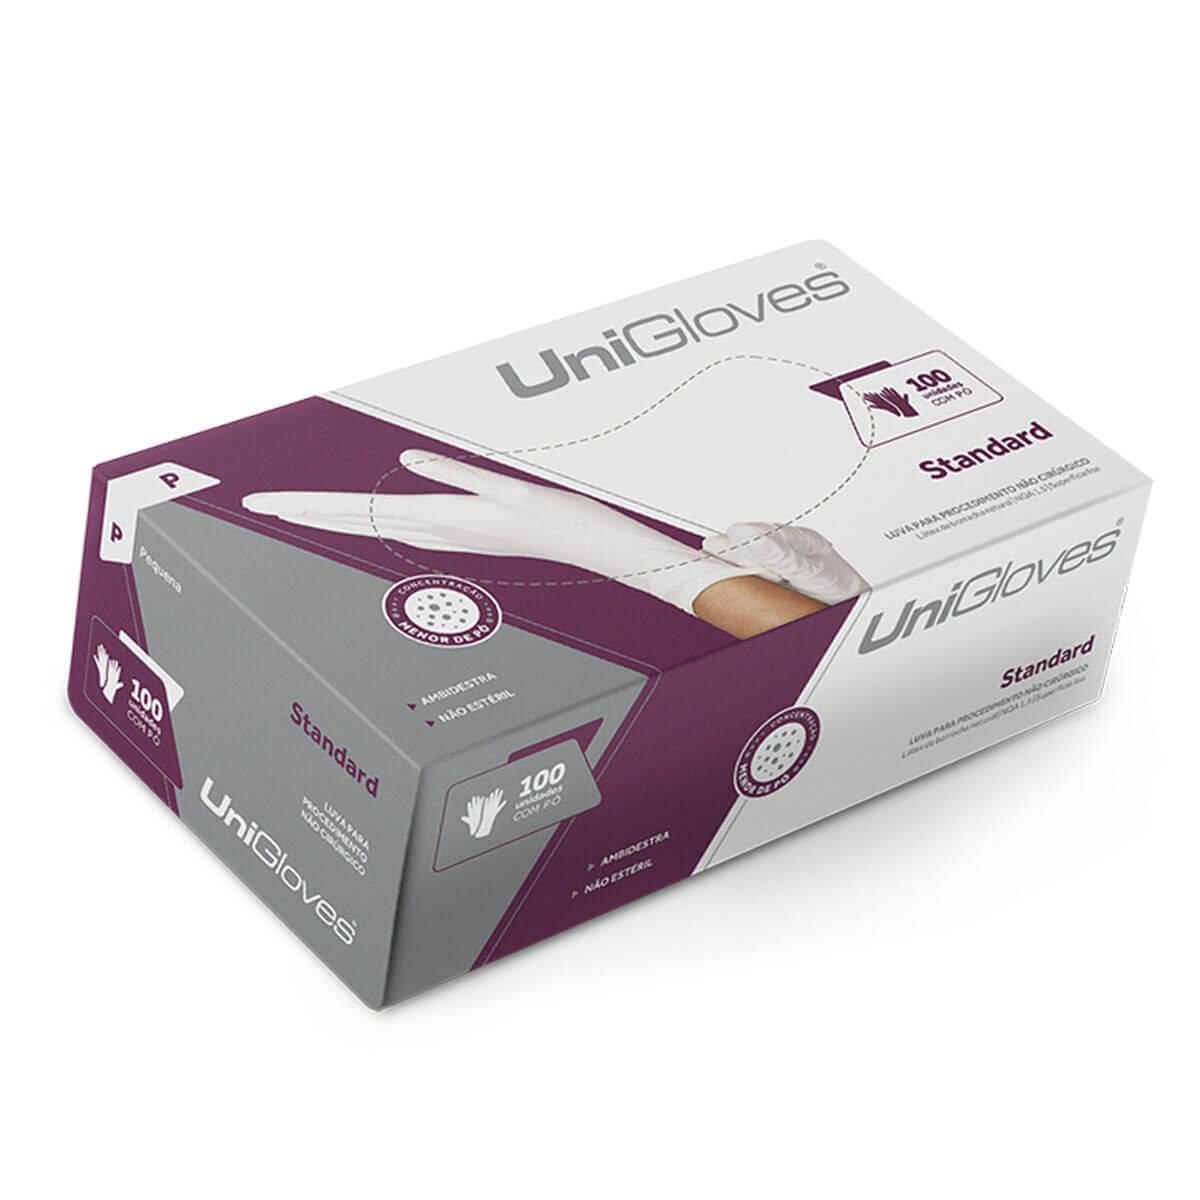 Luva Unigloves Látex com Pó Standard